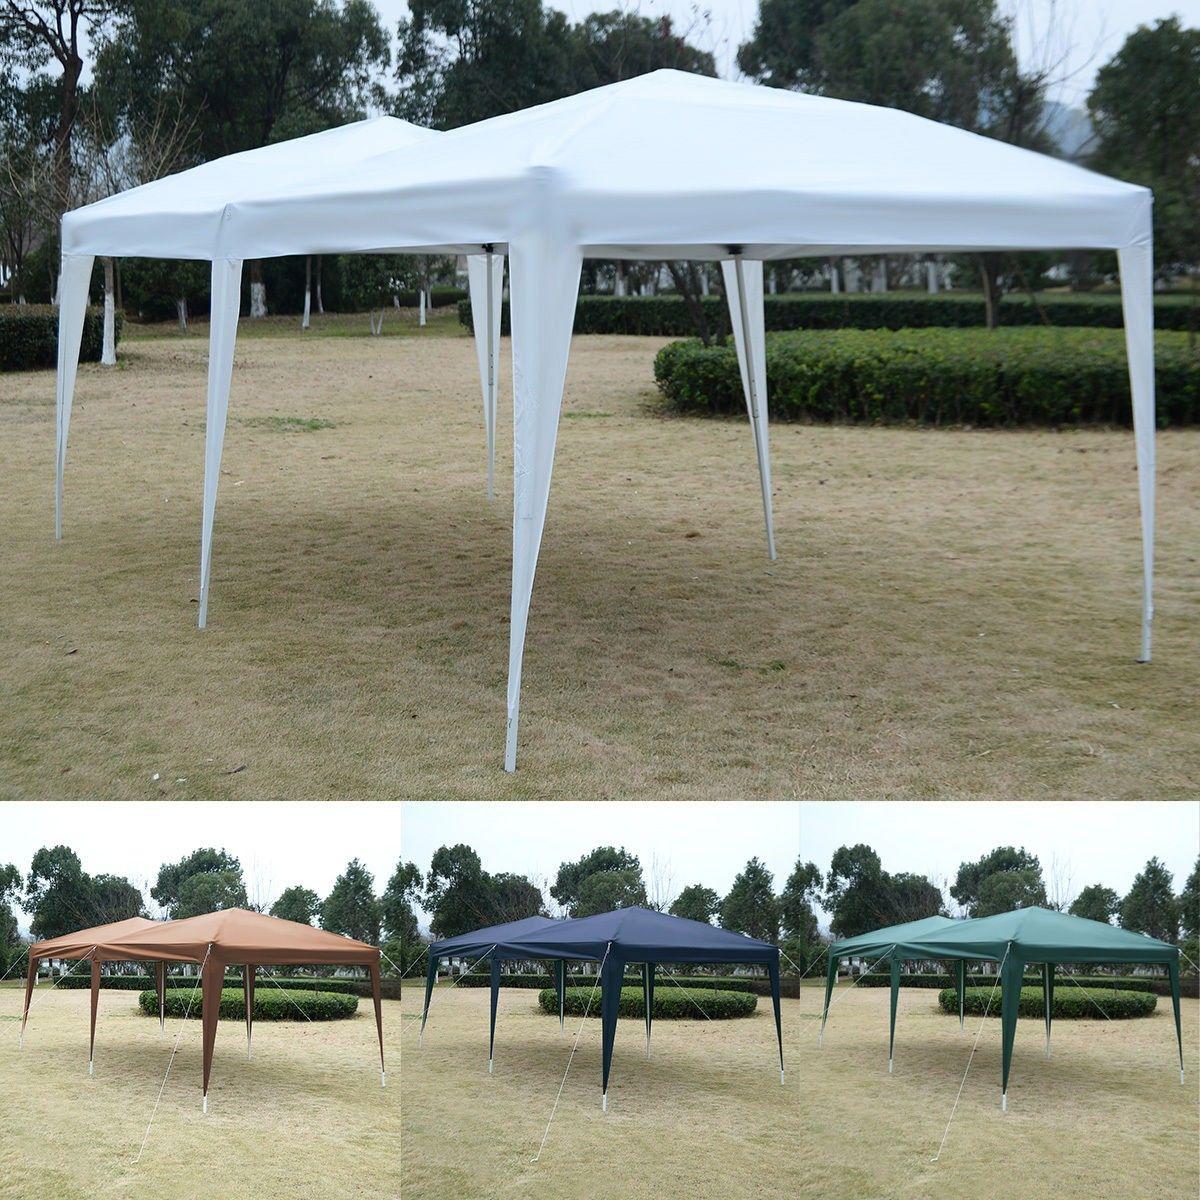 10 X 20 Ez Pop Up Folding Wedding Party Tent Cross Bar Party Tent Gazebo Hot Tub Garden